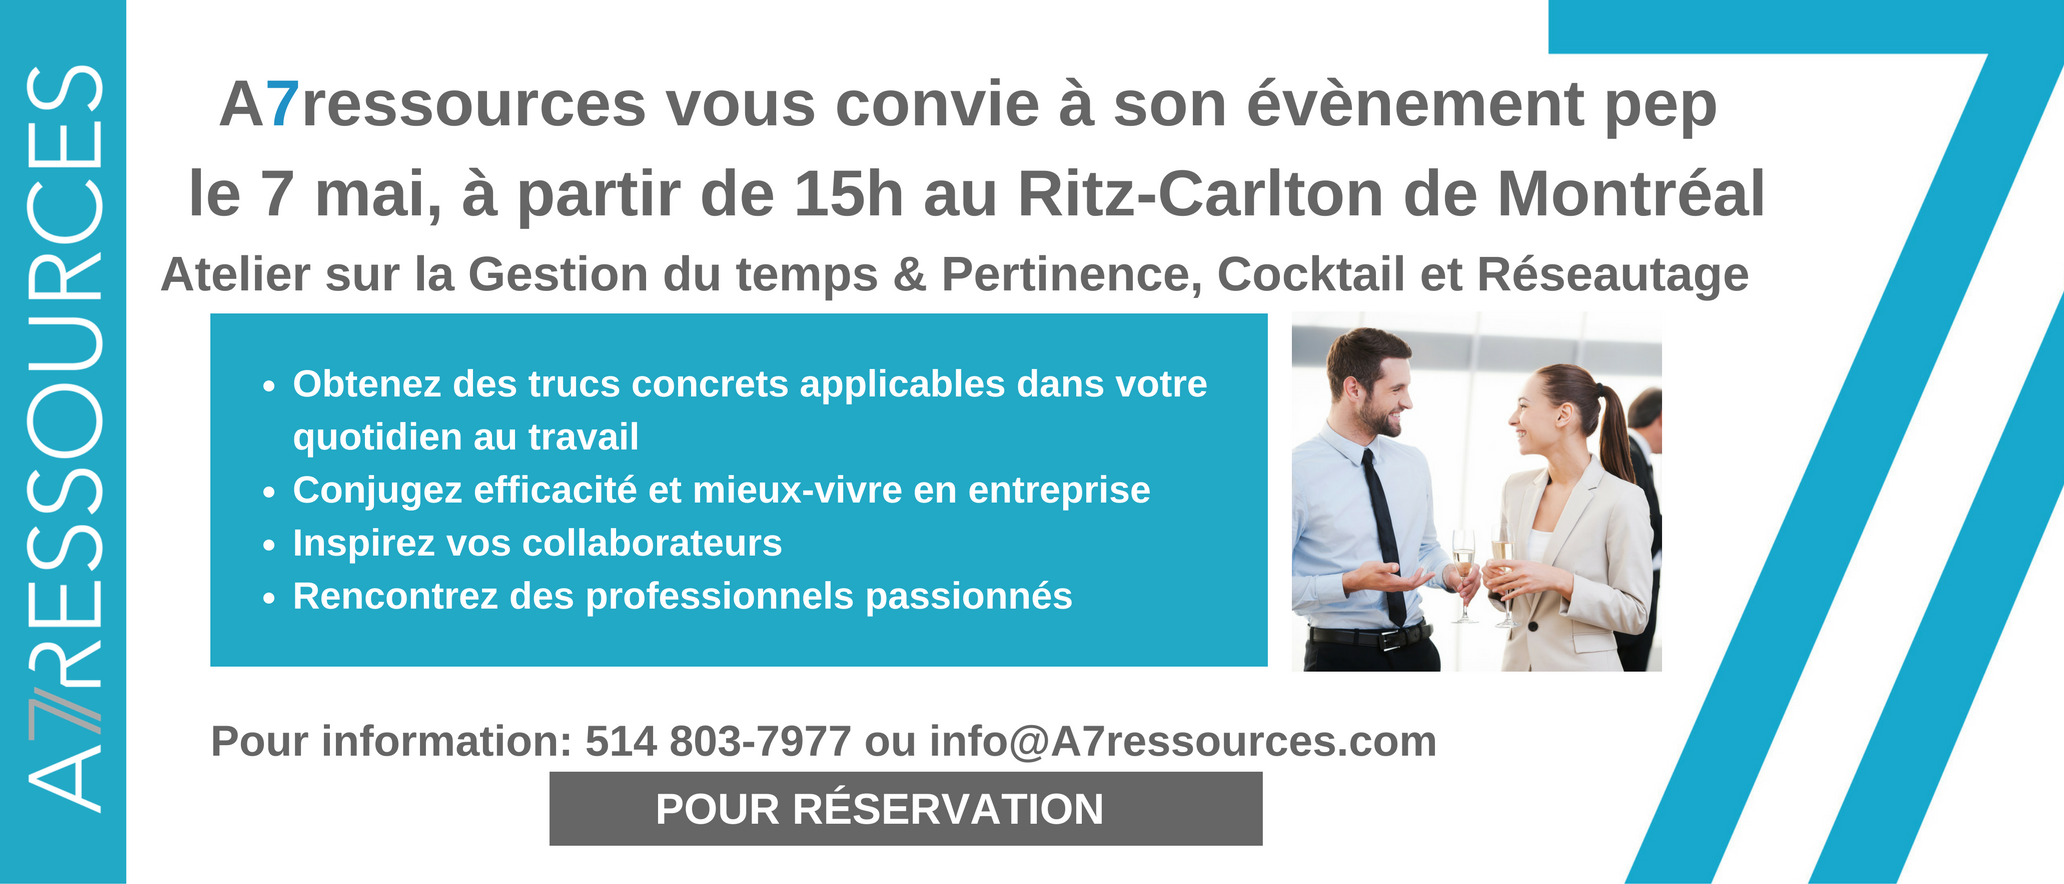 Évènement pep 7 mai Ritz Carlton